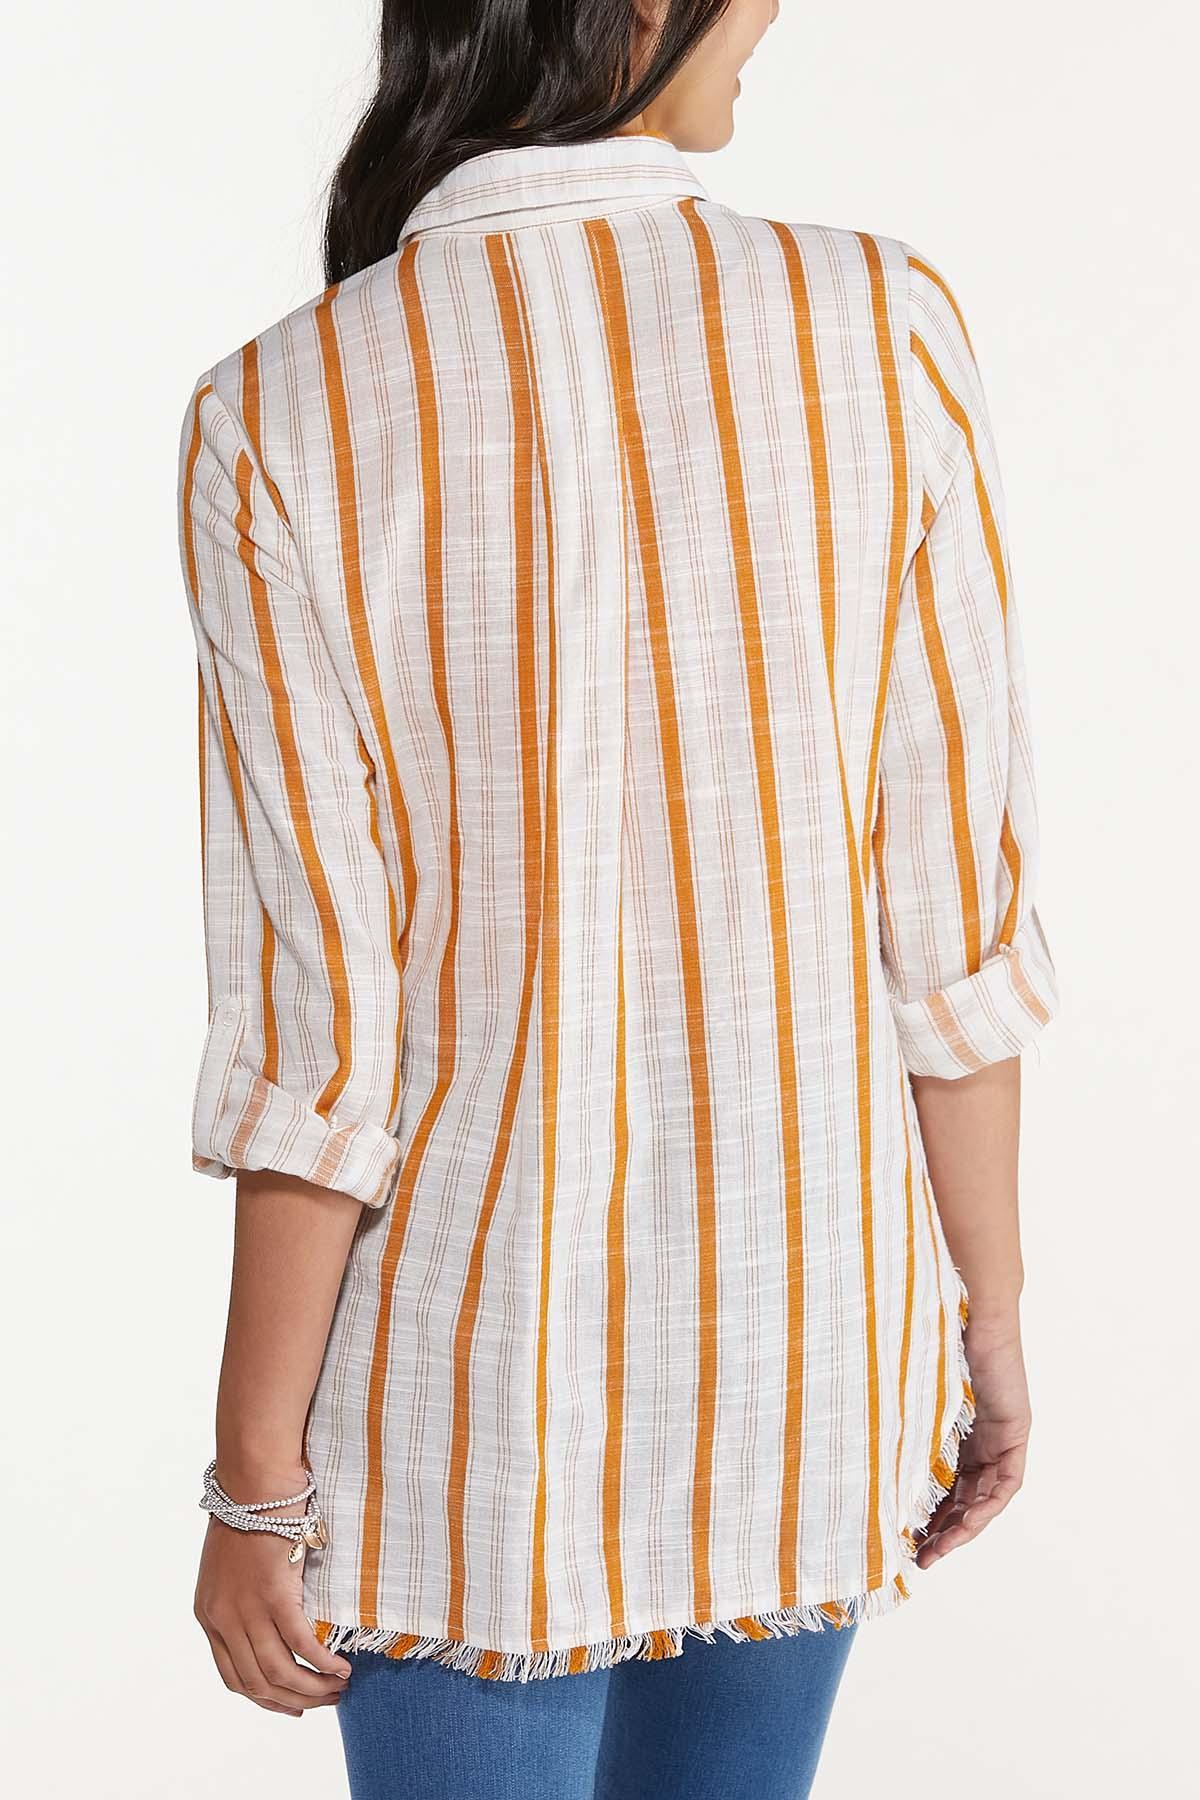 Frayed Gold Stripe Tunic (Item #44676336)